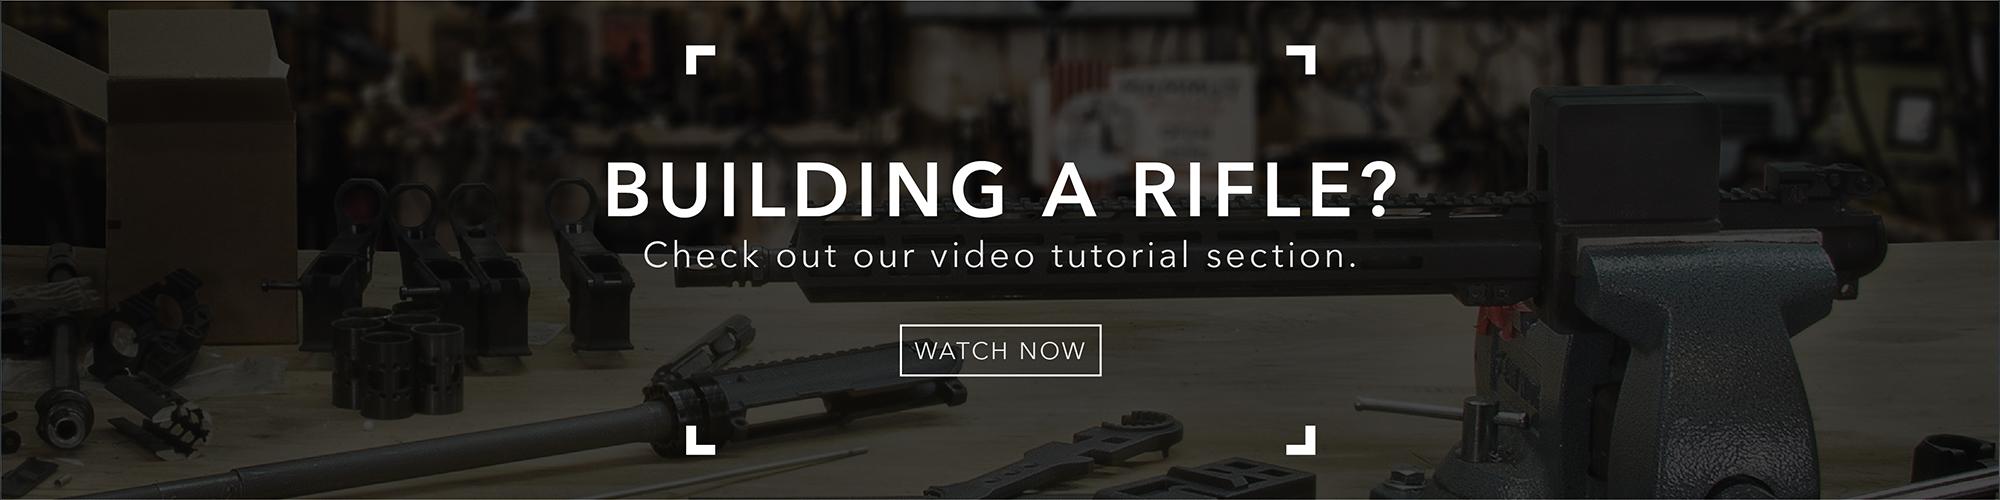 build a rifle video tutorial banner